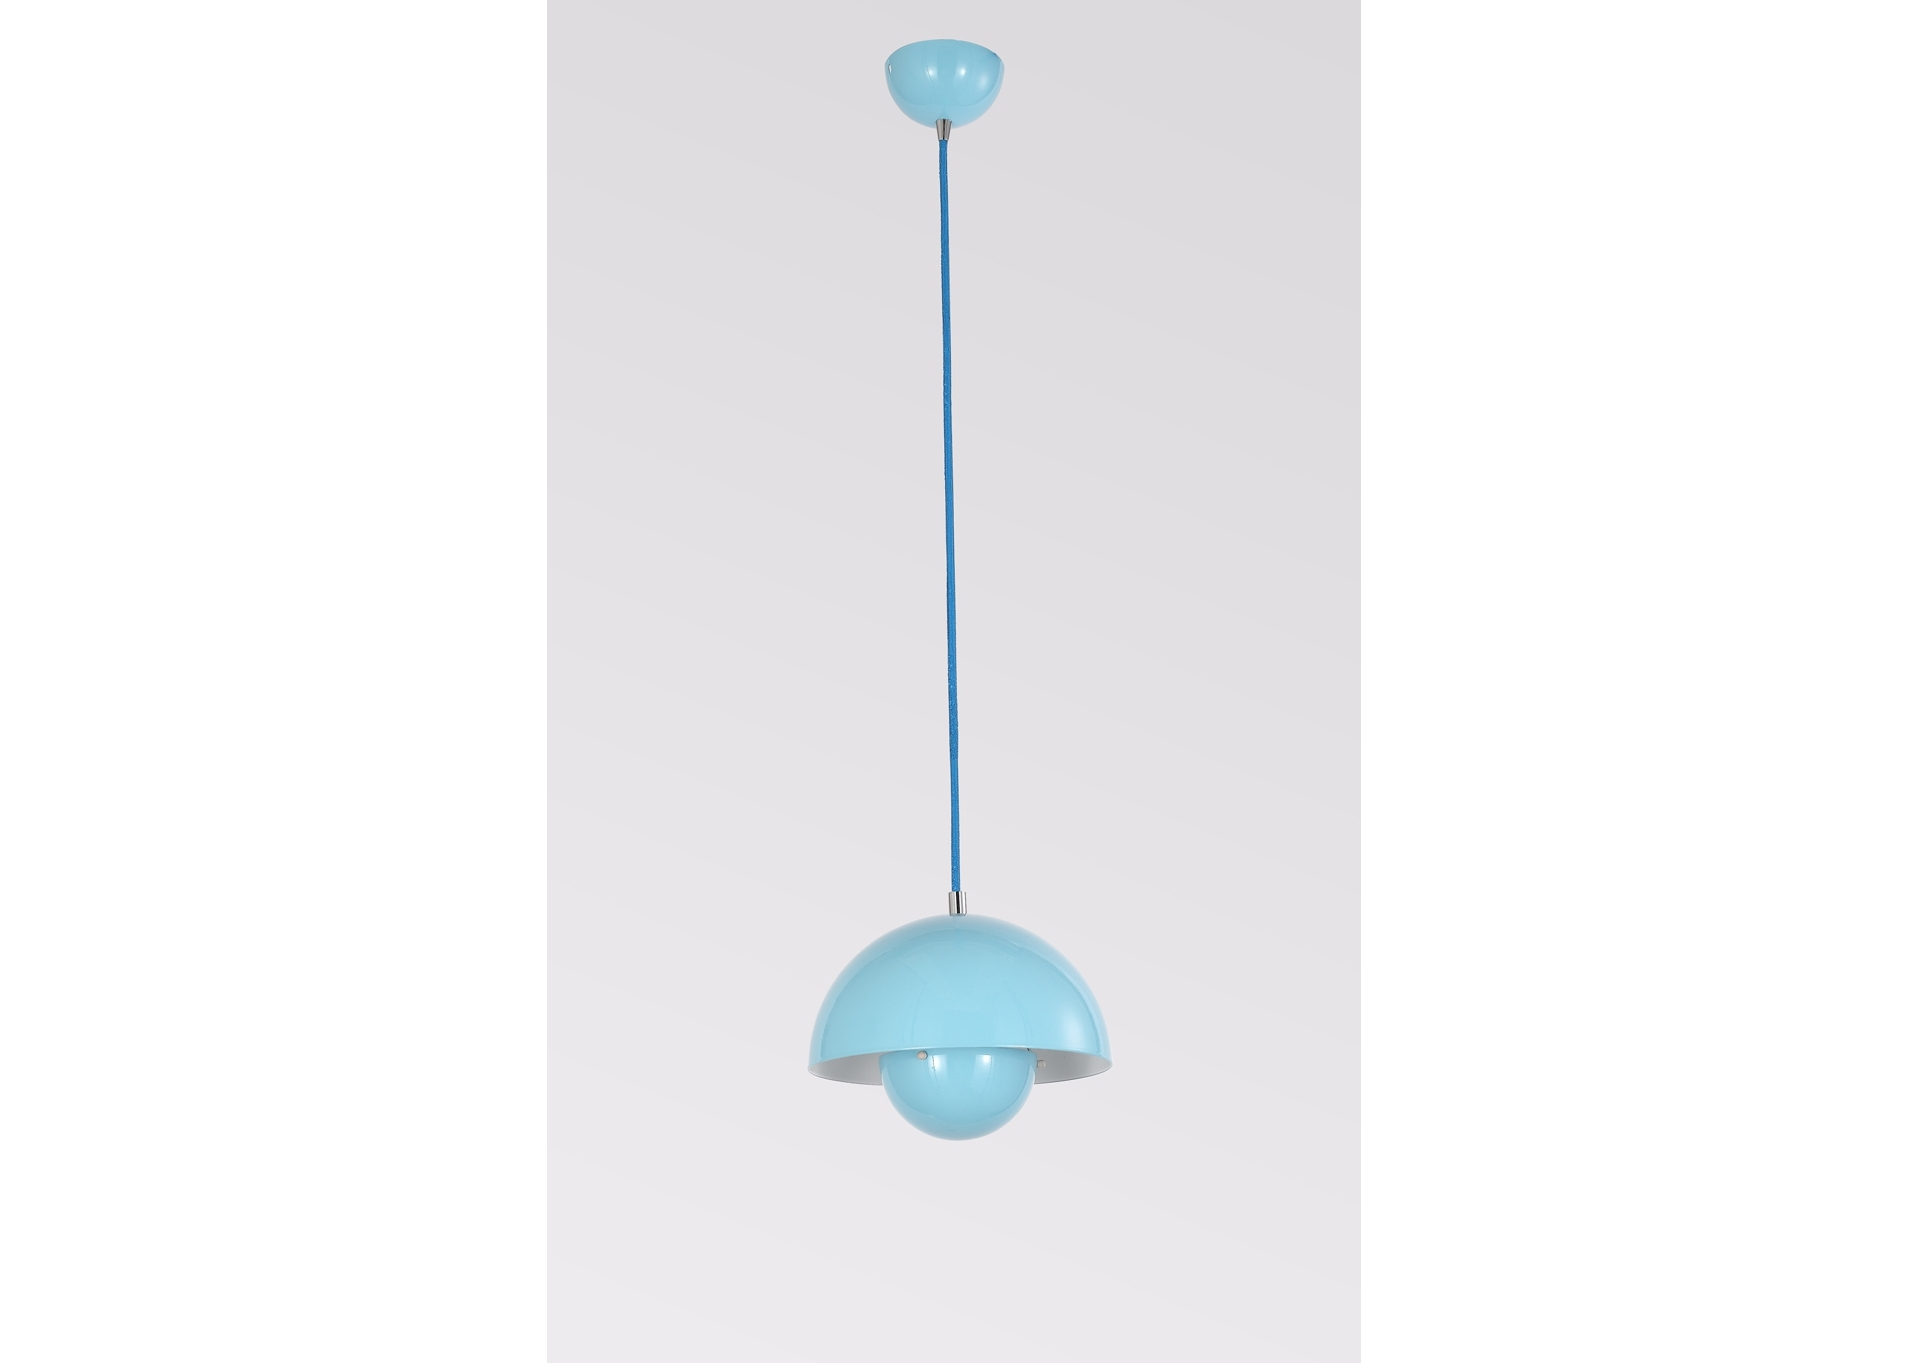 Подвесной светильник NarniПодвесные светильники<br>Материал: Металл<br>Design by Ketty Smith USA<br>Источник света: 1*60W (E27)<br>Особенности:<br>  а) Алюминий<br>  b) Цвет Blue&amp;amp;nbsp;<br><br>Material: Металл<br>Высота см: 17.6